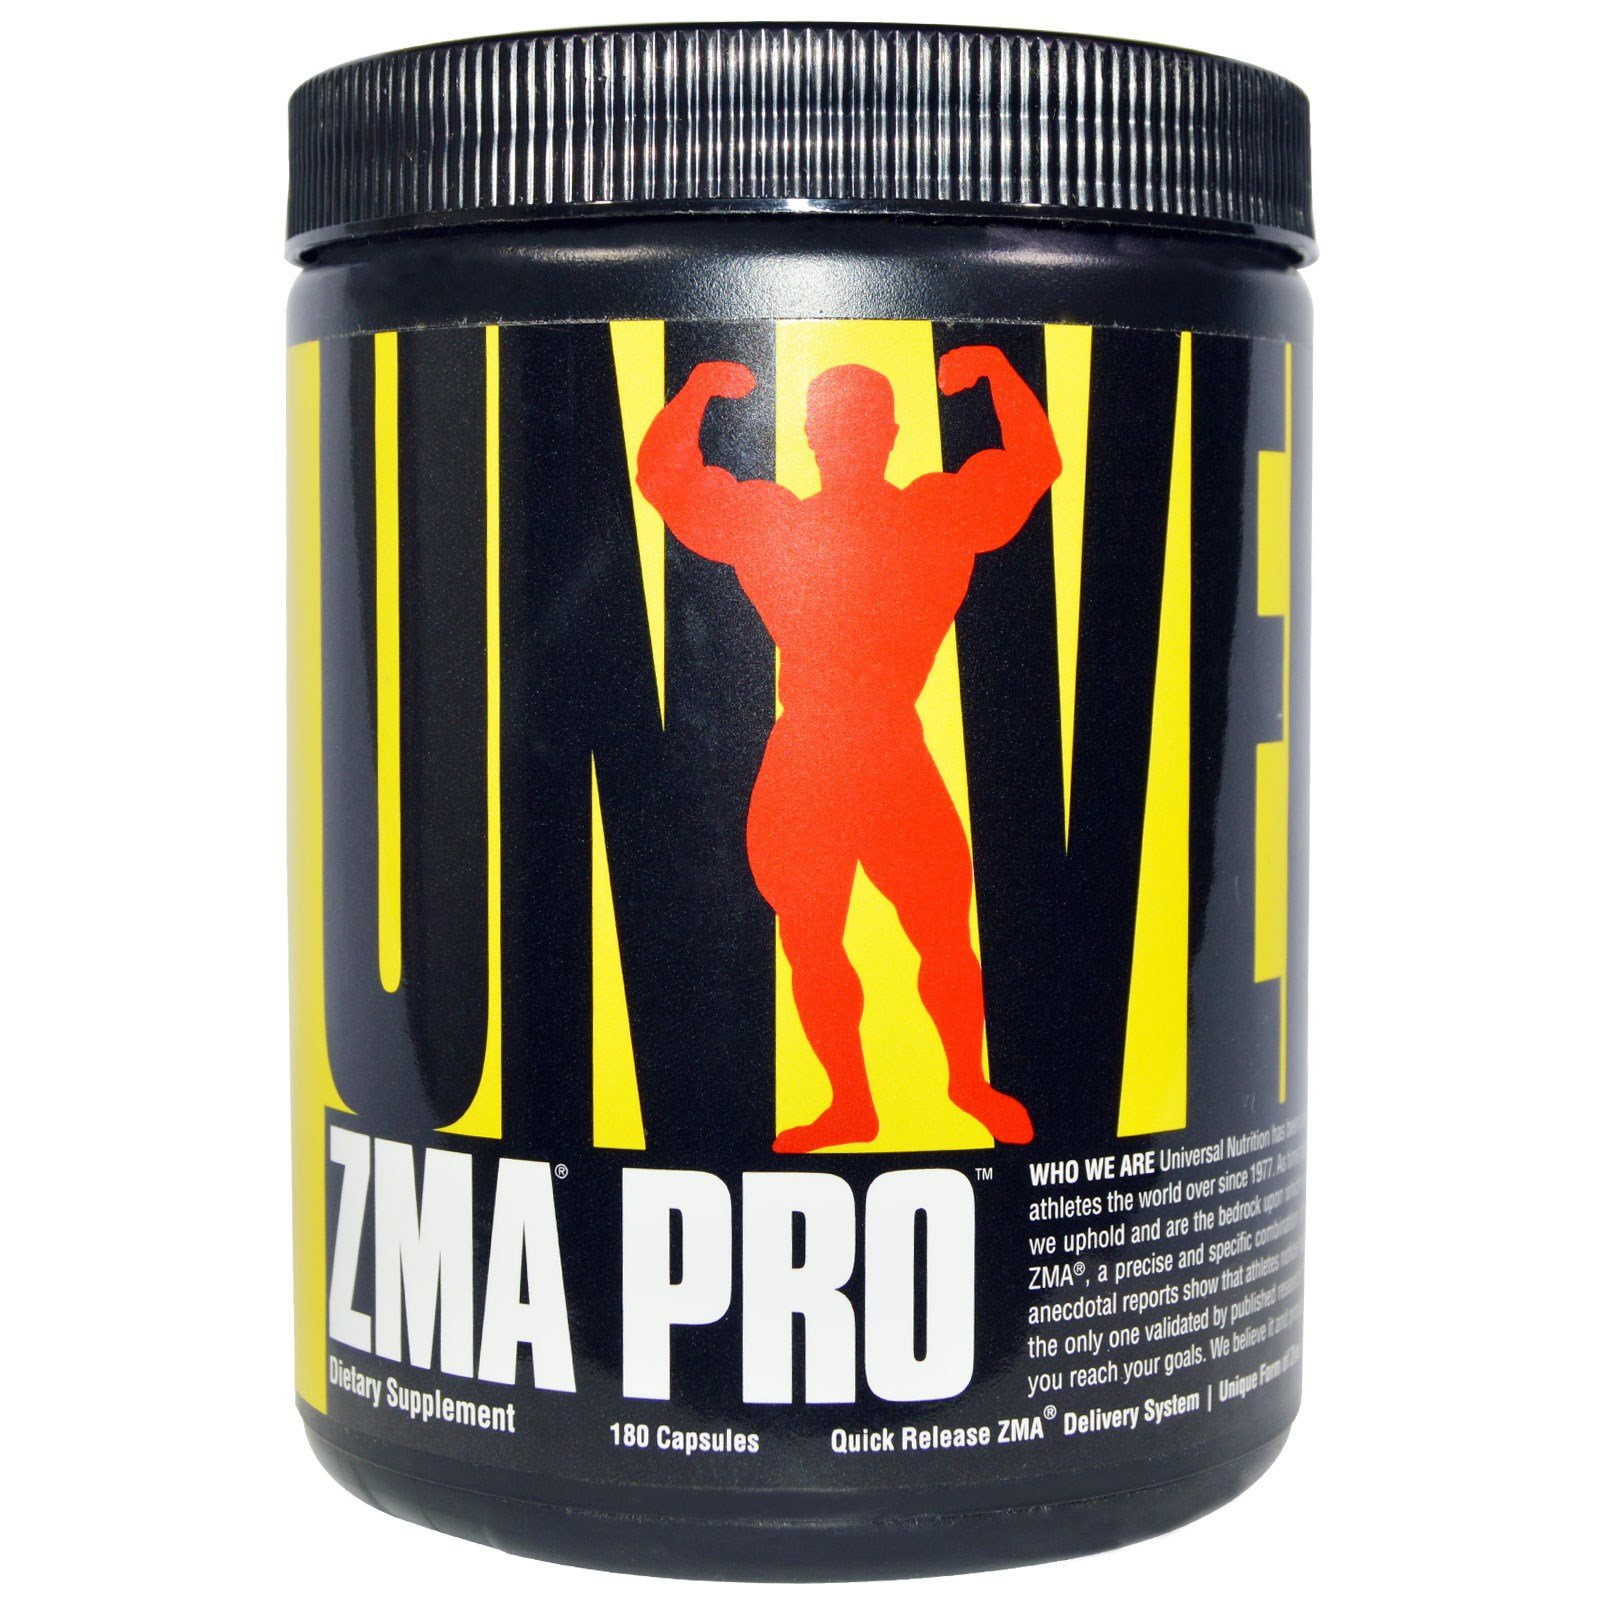 Universal Nutrition, ZMA Pro, 180 Capsules - 2pc